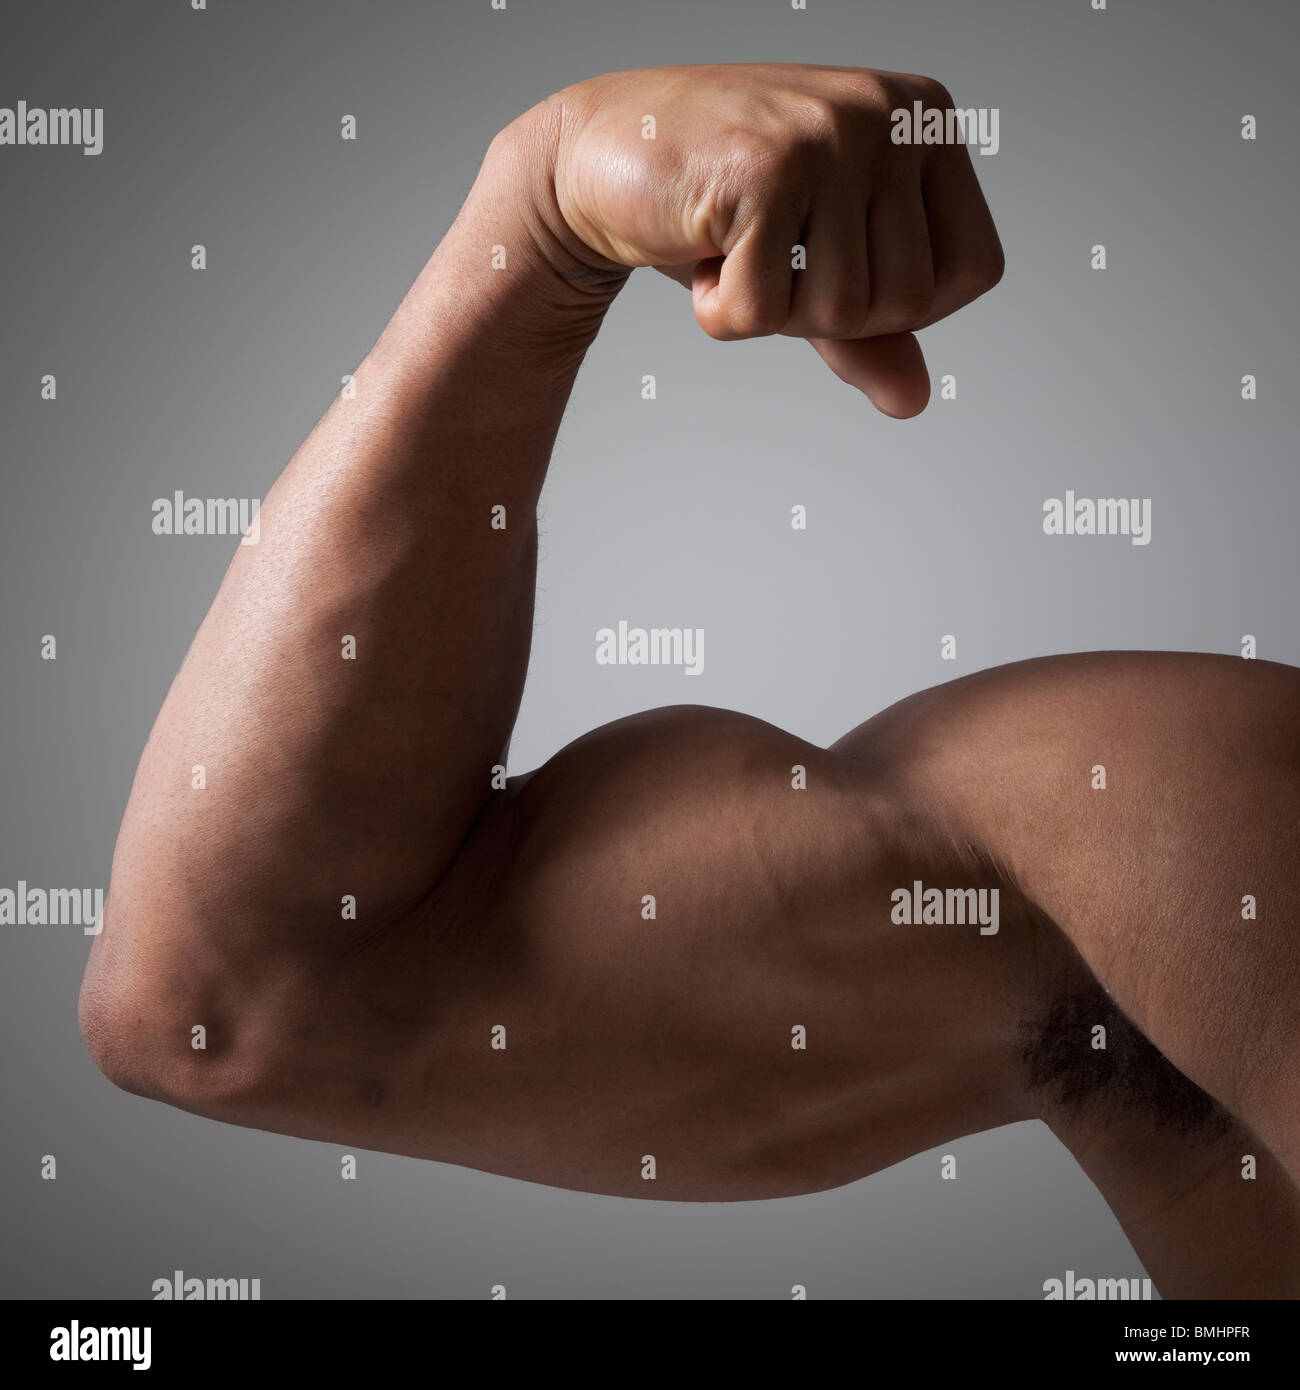 Flexed muscular arm - Stock Image